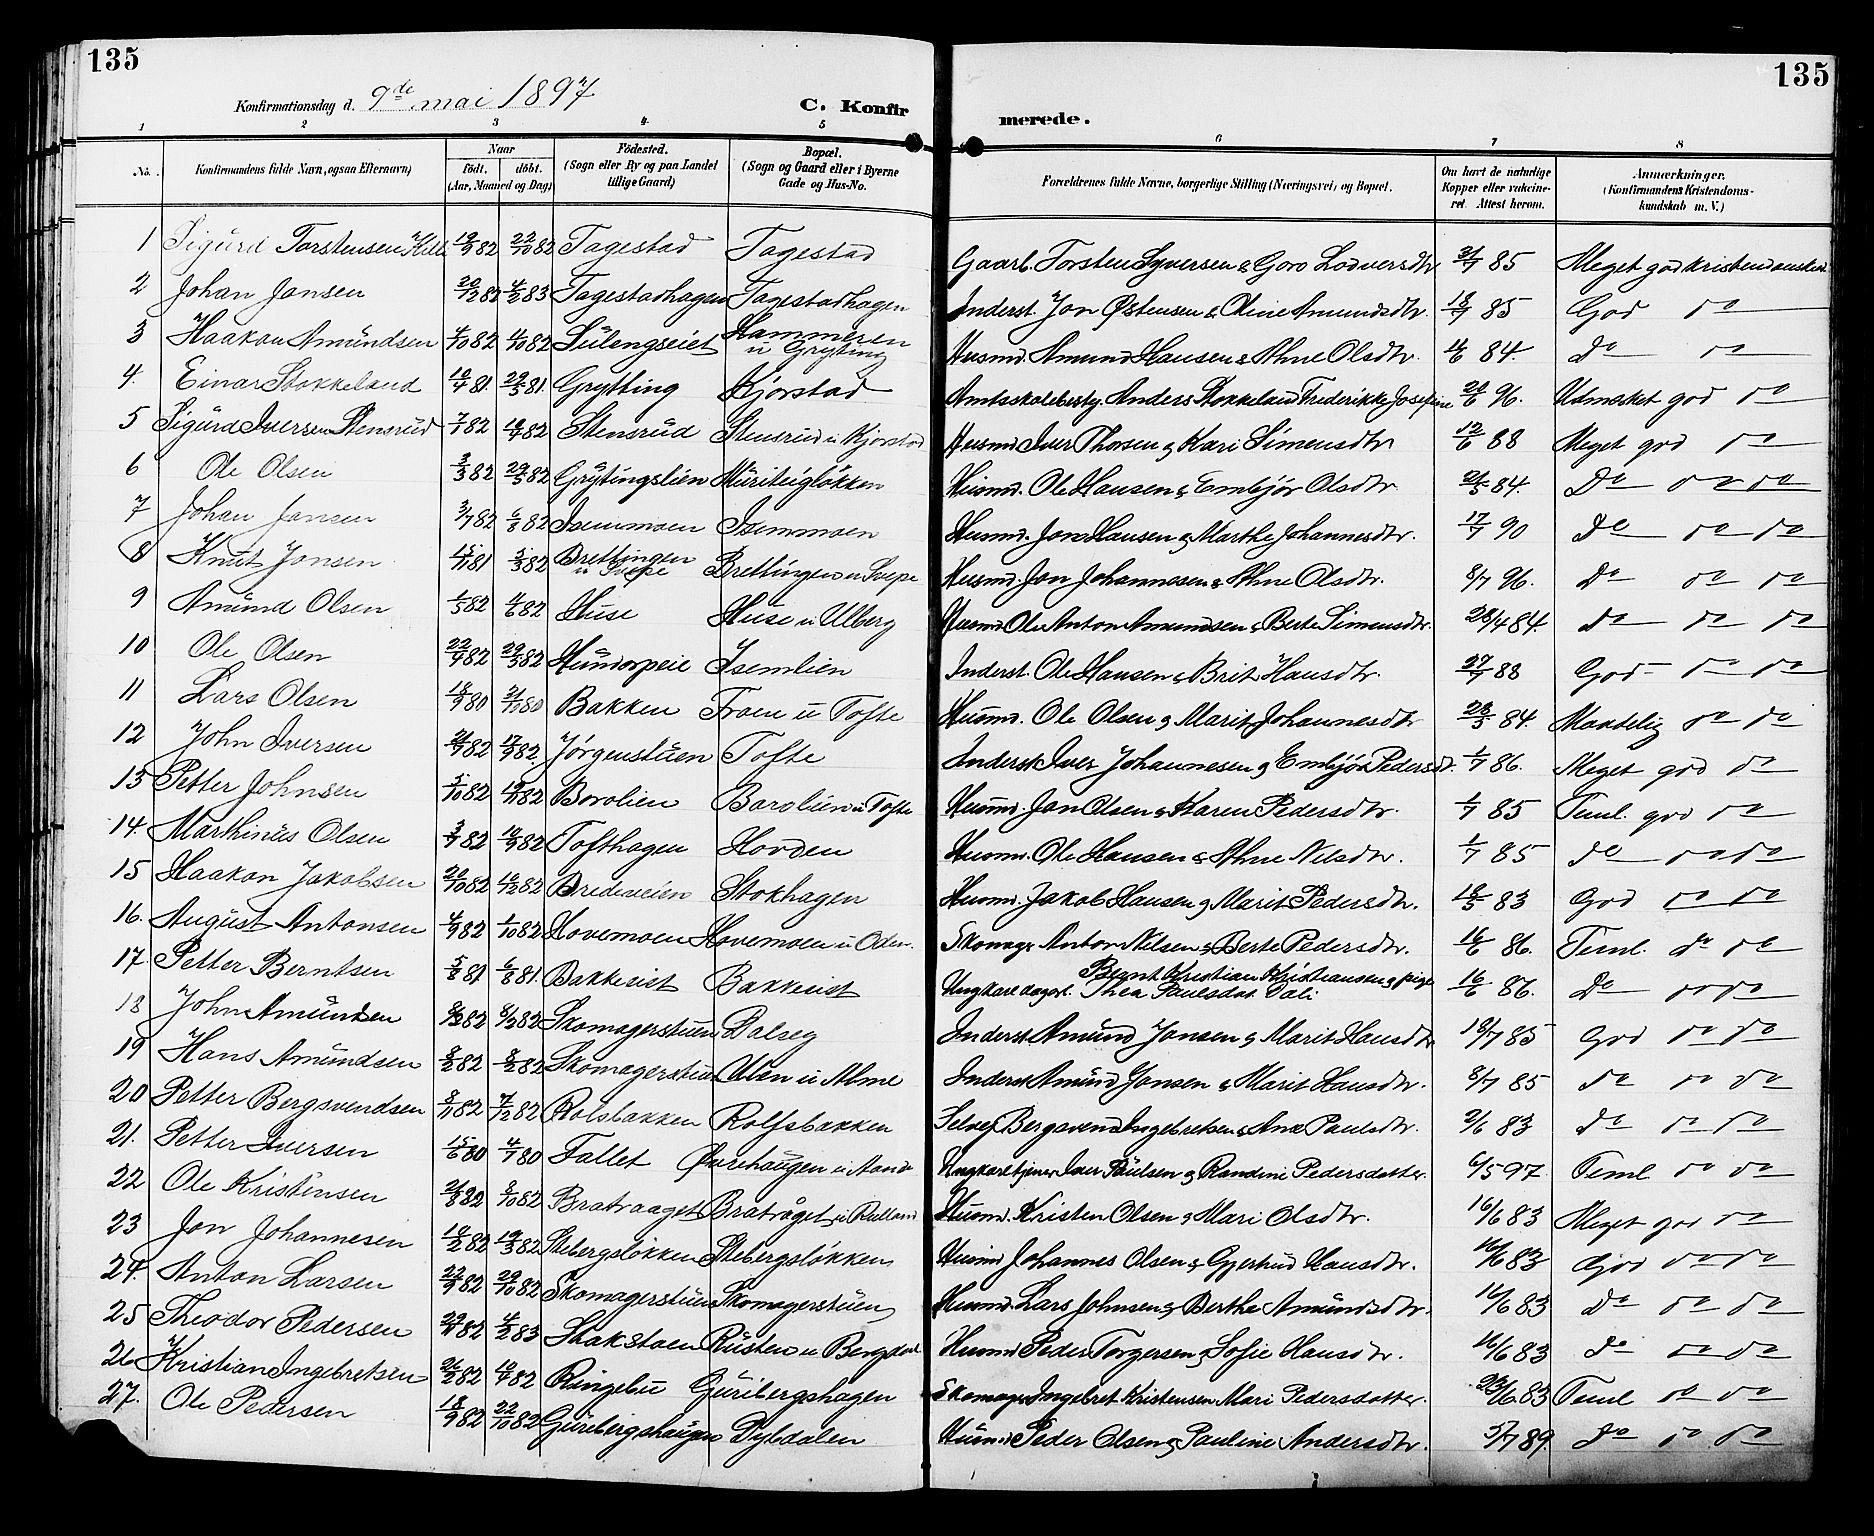 SAH, Sør-Fron prestekontor, H/Ha/Hab/L0004: Klokkerbok nr. 4, 1896-1911, s. 135